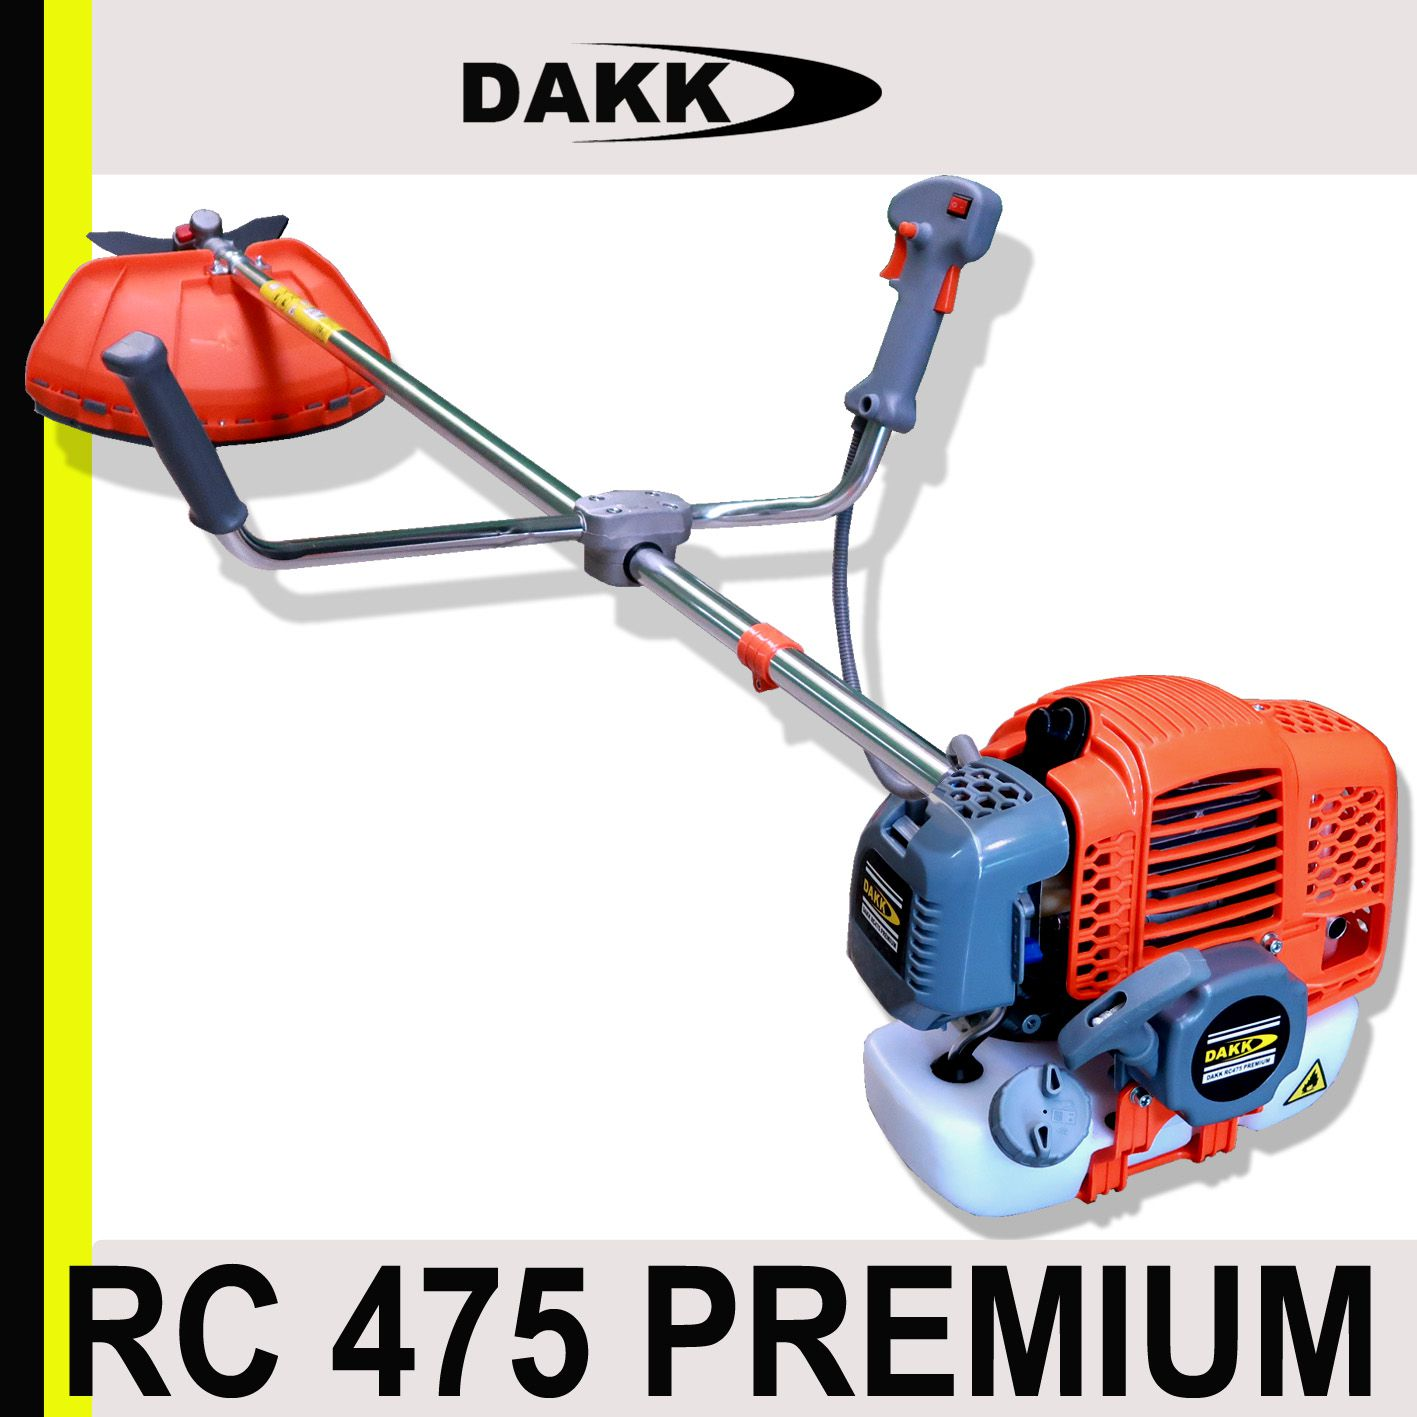 Roçadeira DAKK RC475 PREMIUM